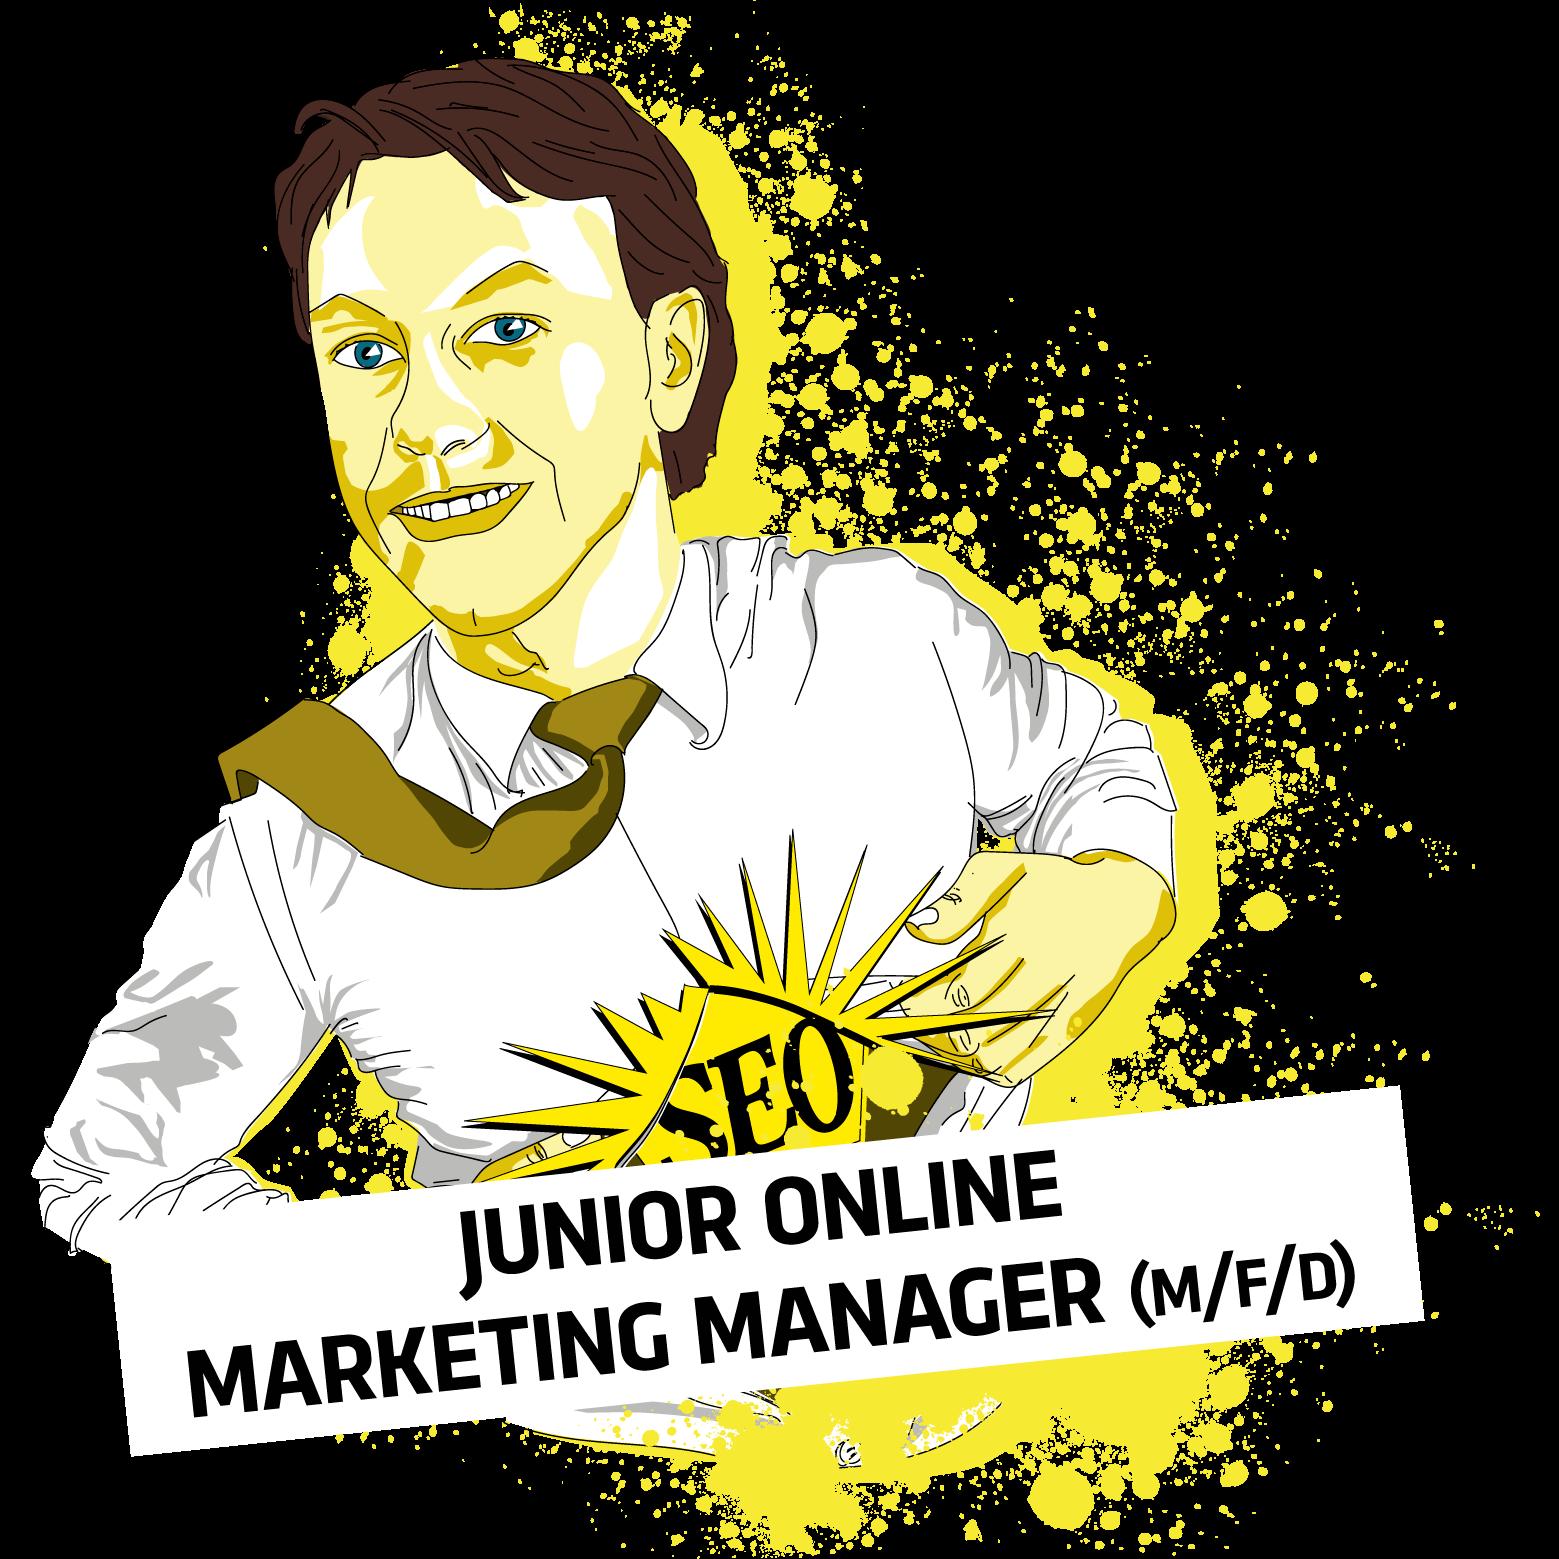 Senior Online-Marketing Manager